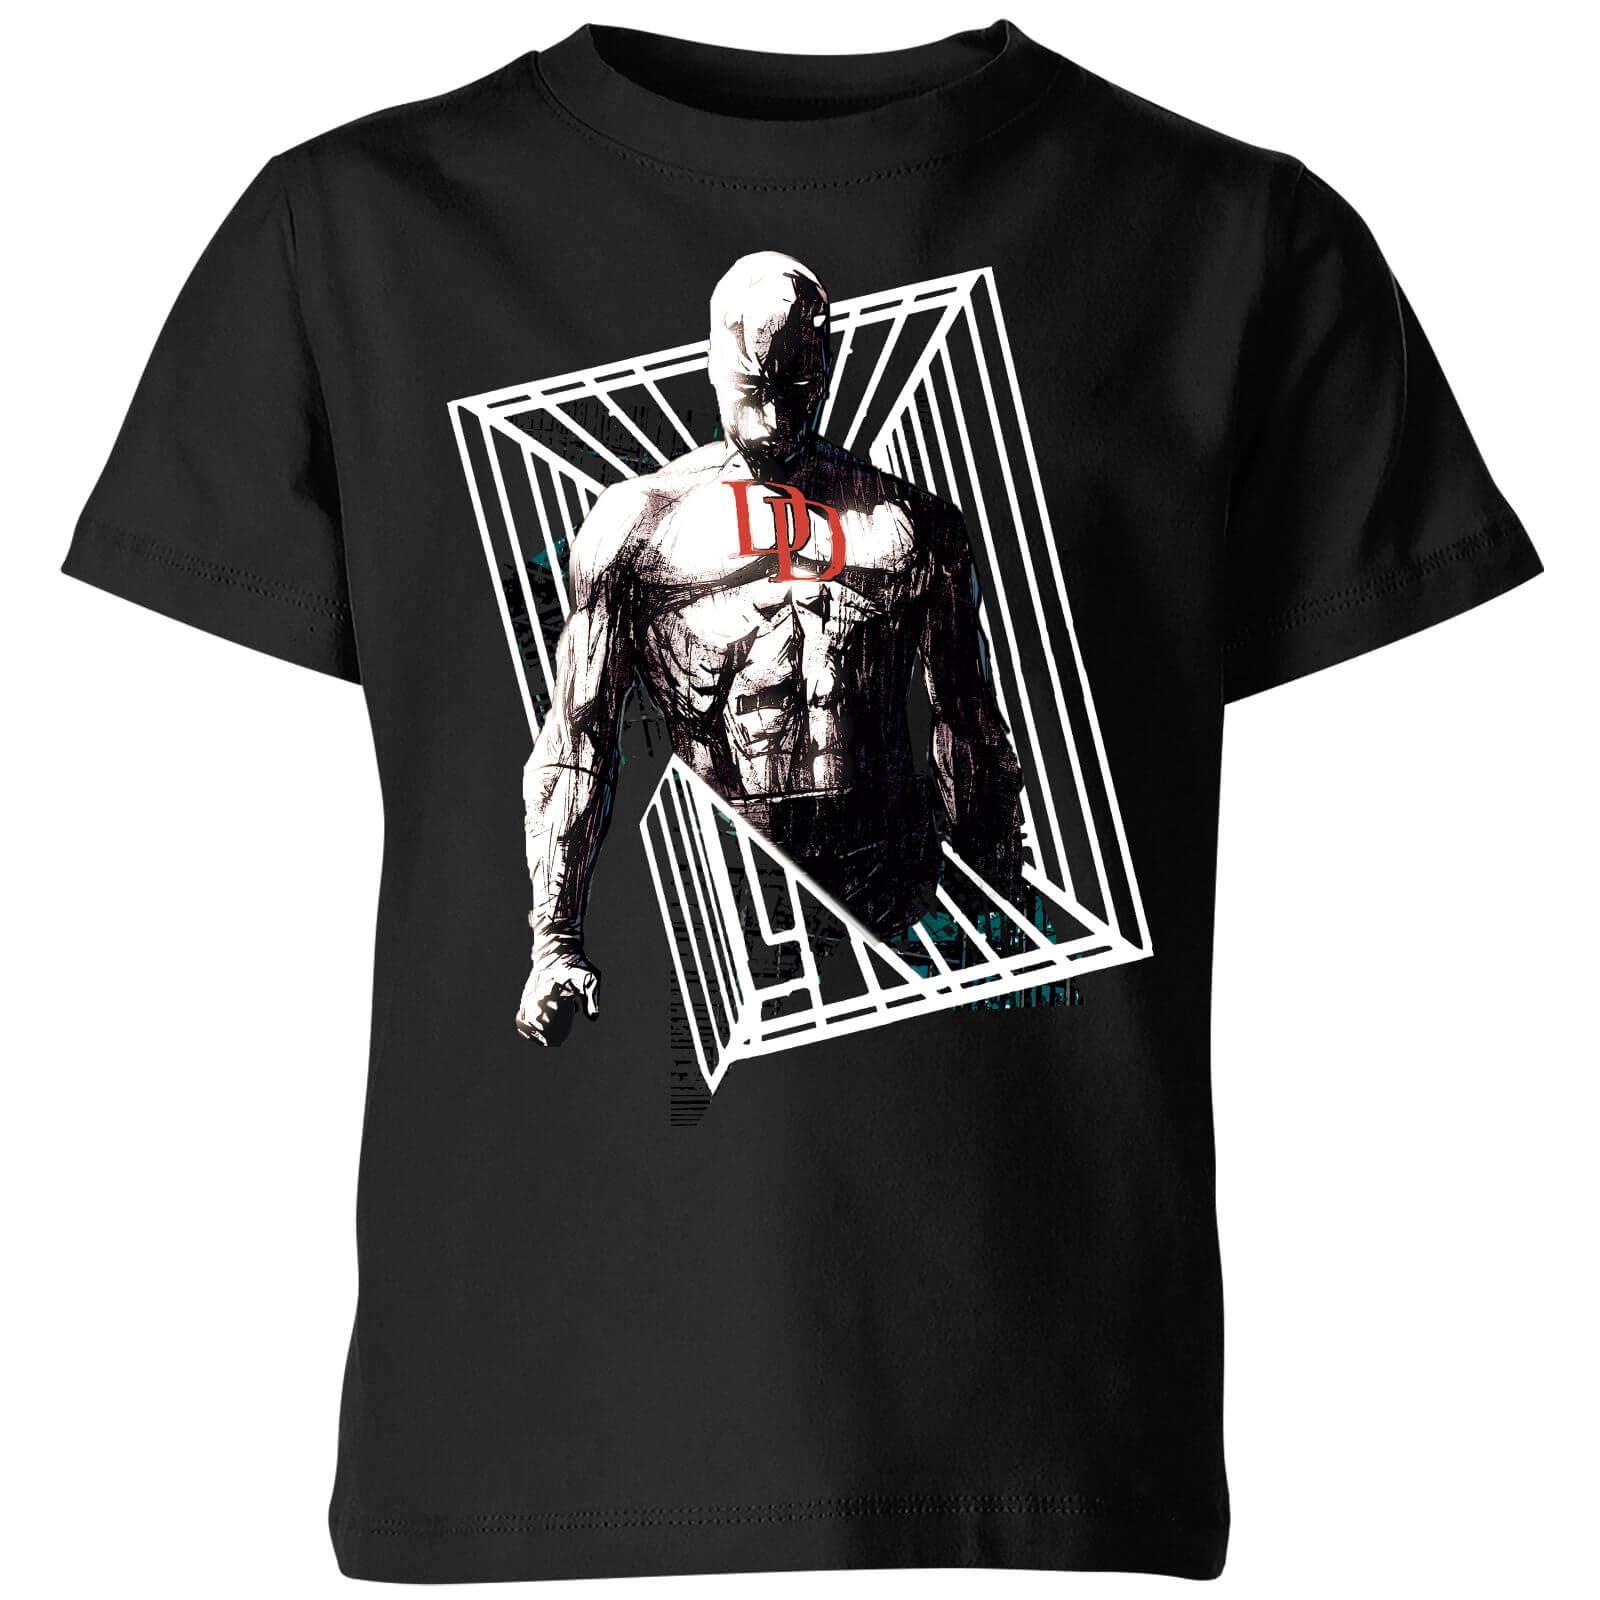 OfferteWeb.click 69-t-shirt-marvel-knights-daredevil-cage-nero-bambini